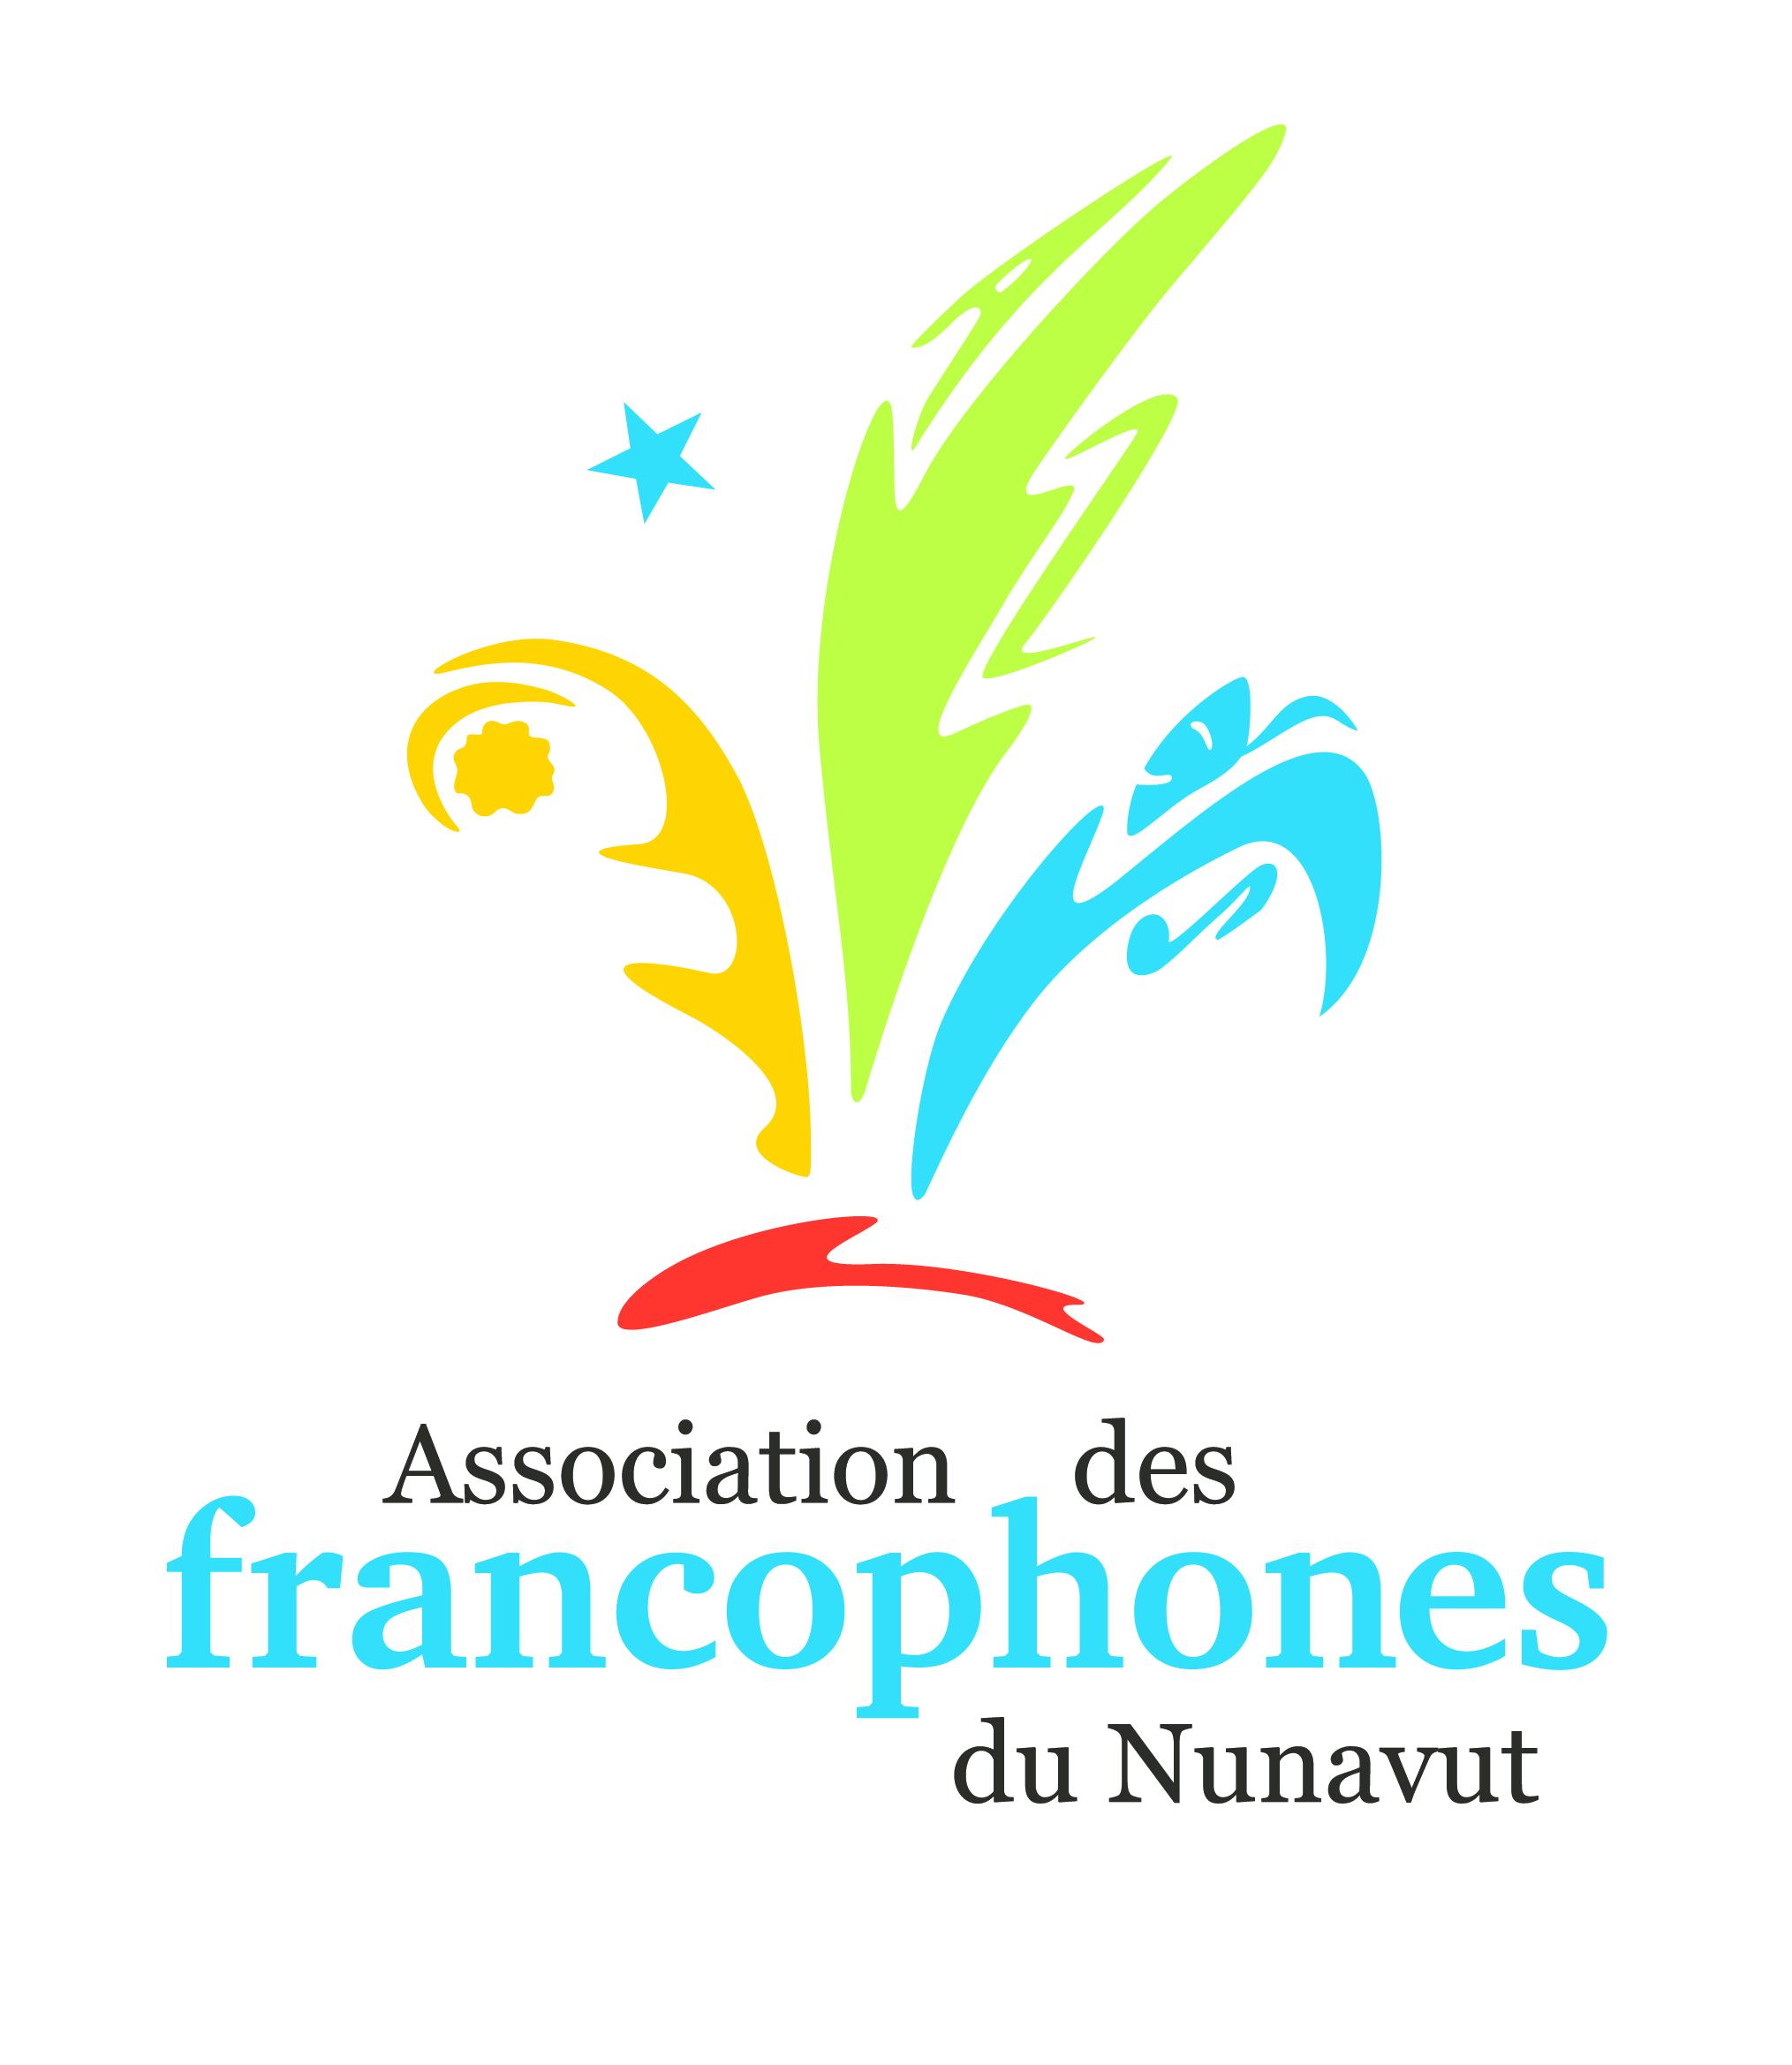 AFN Logo_VRTCL_COLOUR.jpg